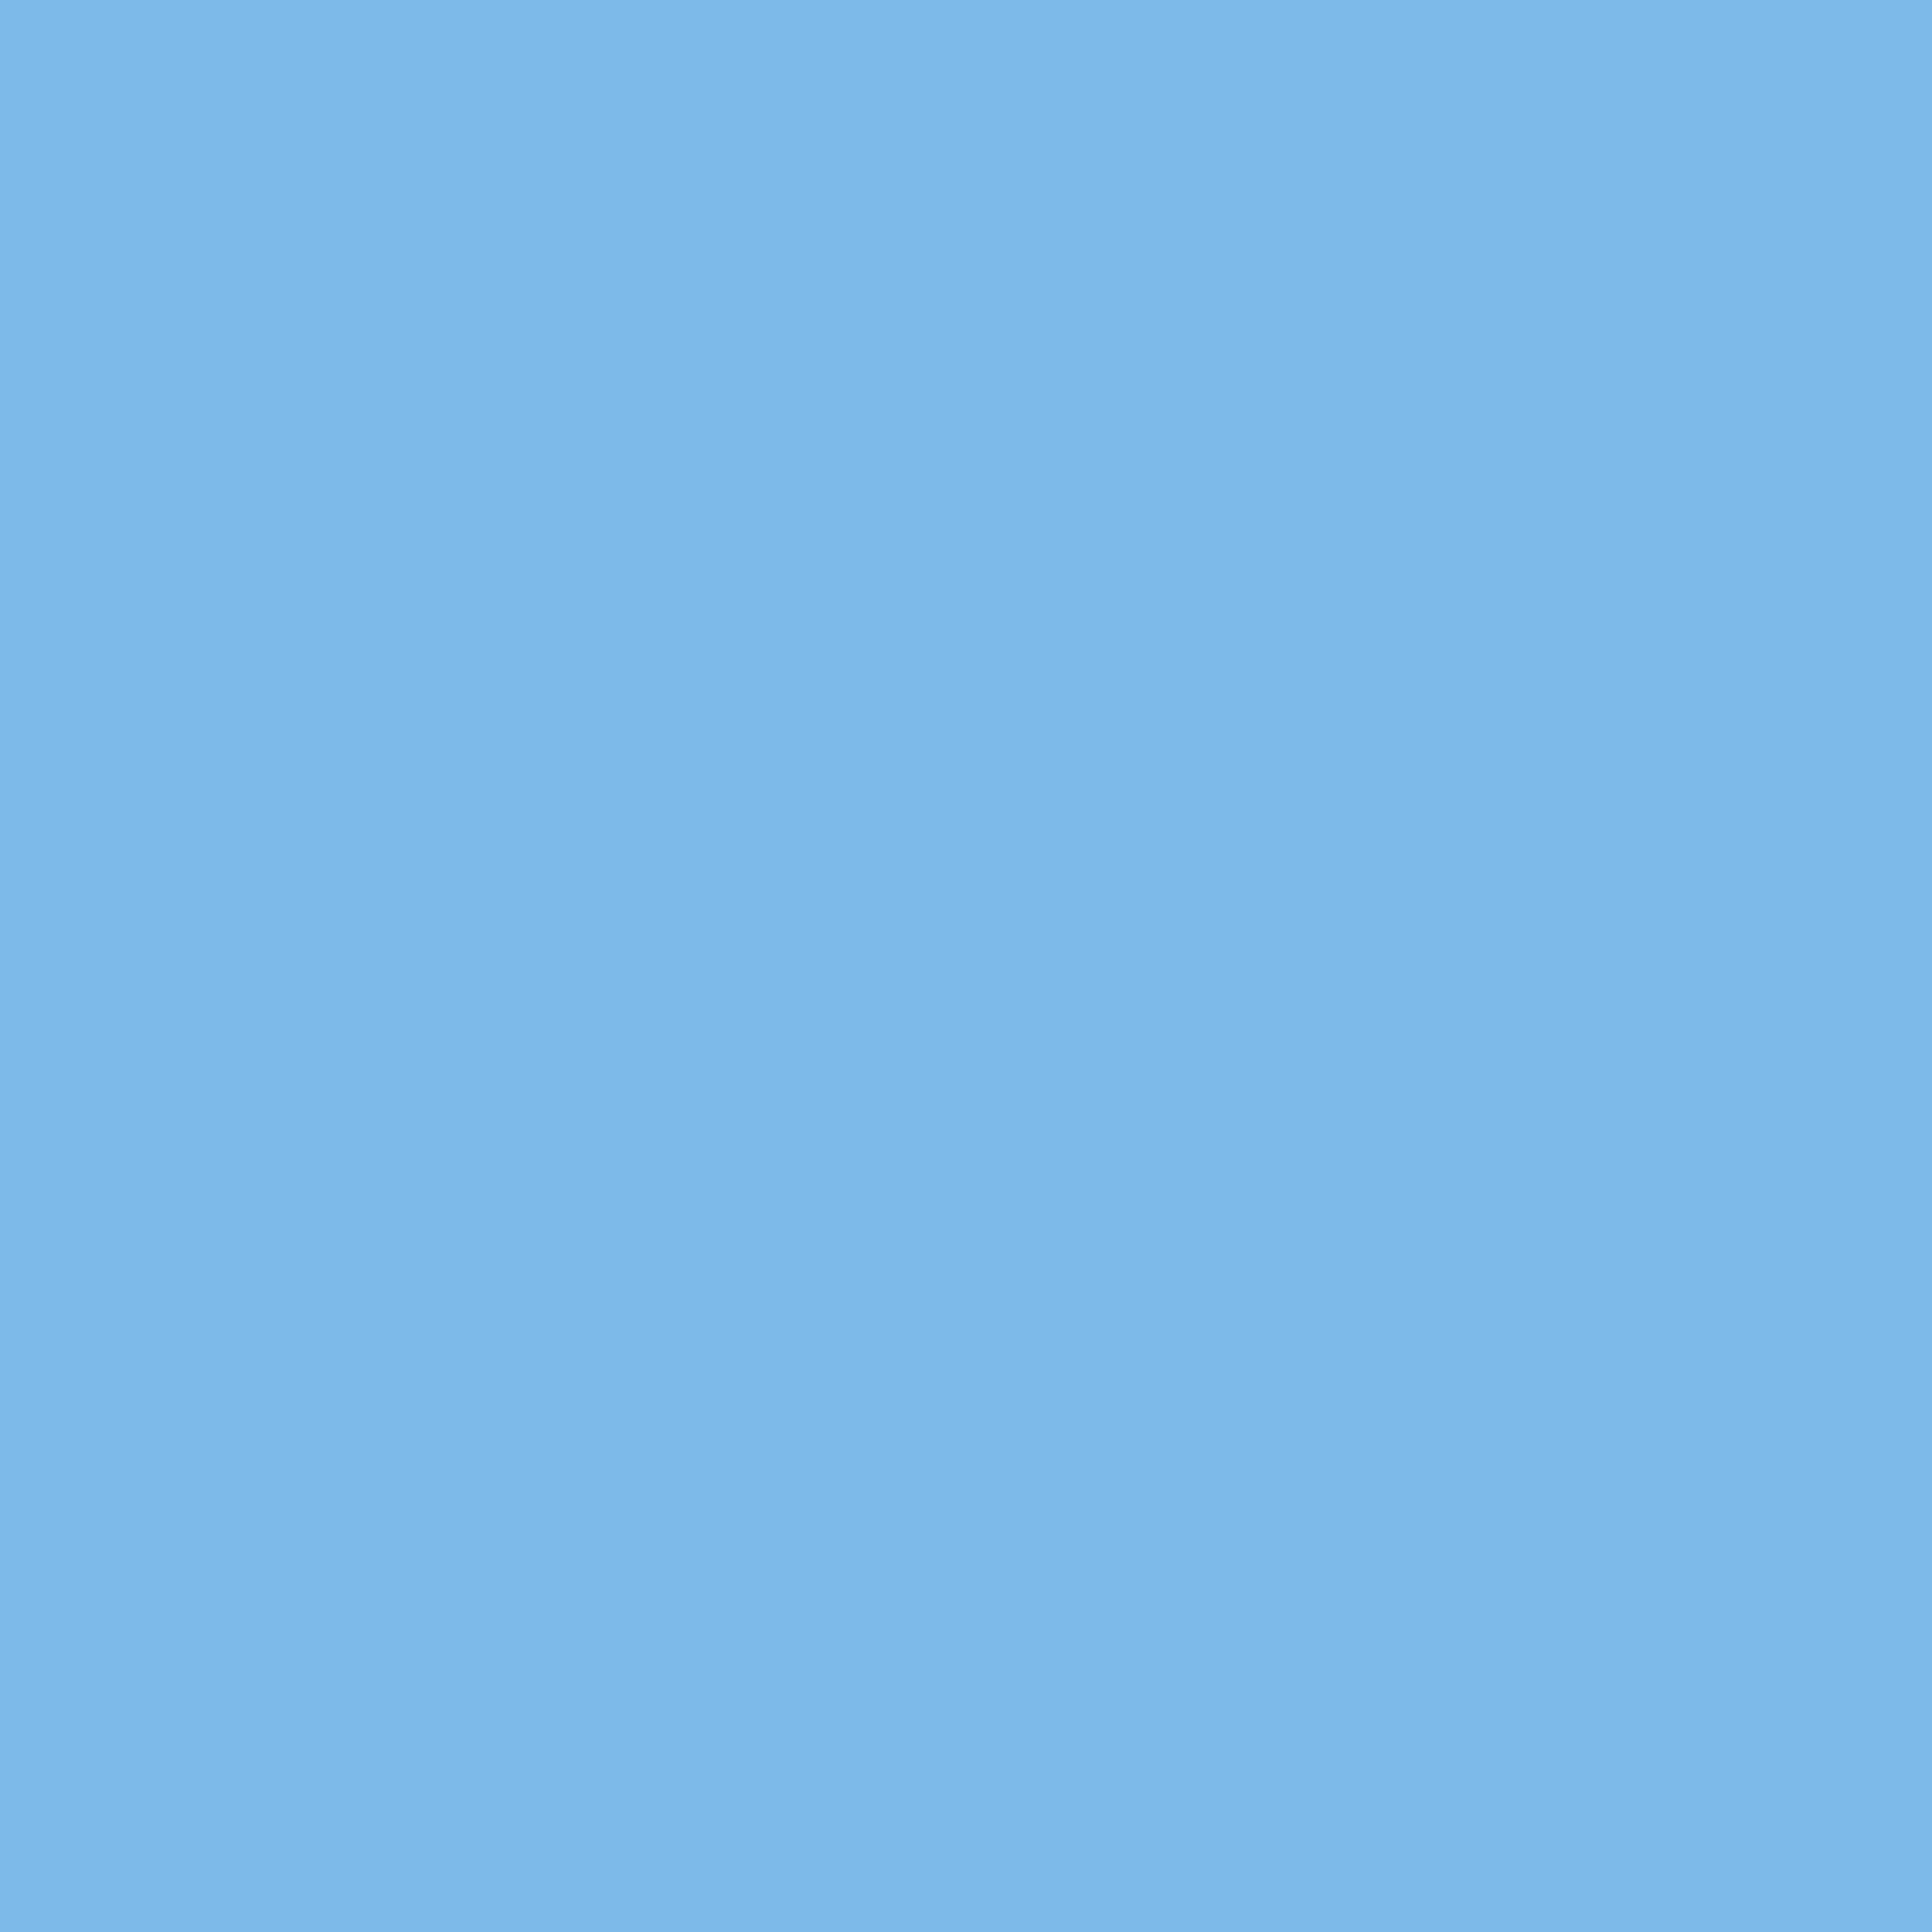 2732x2732 Aero Solid Color Background